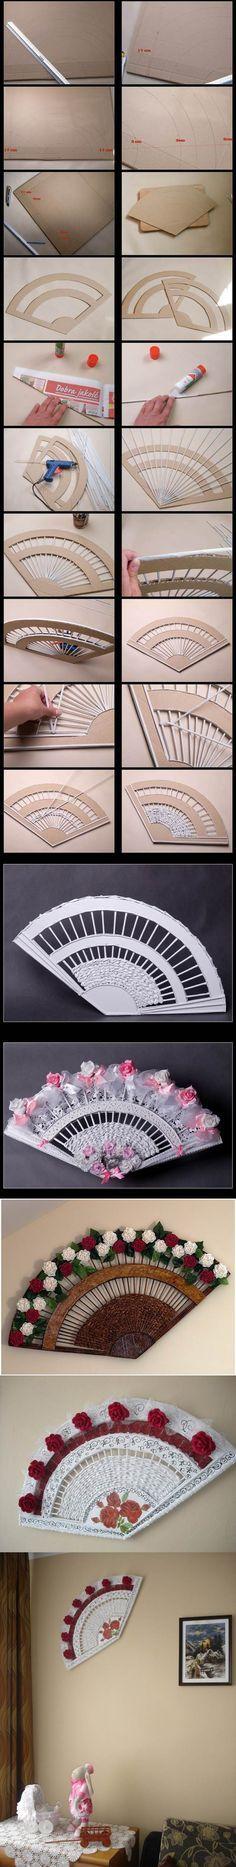 DIY Decorative Fan from Old Newspaper and Cardboard | iCreativeIdeas.com Follow Us on Facebook --> https://www.facebook.com/icreativeideas